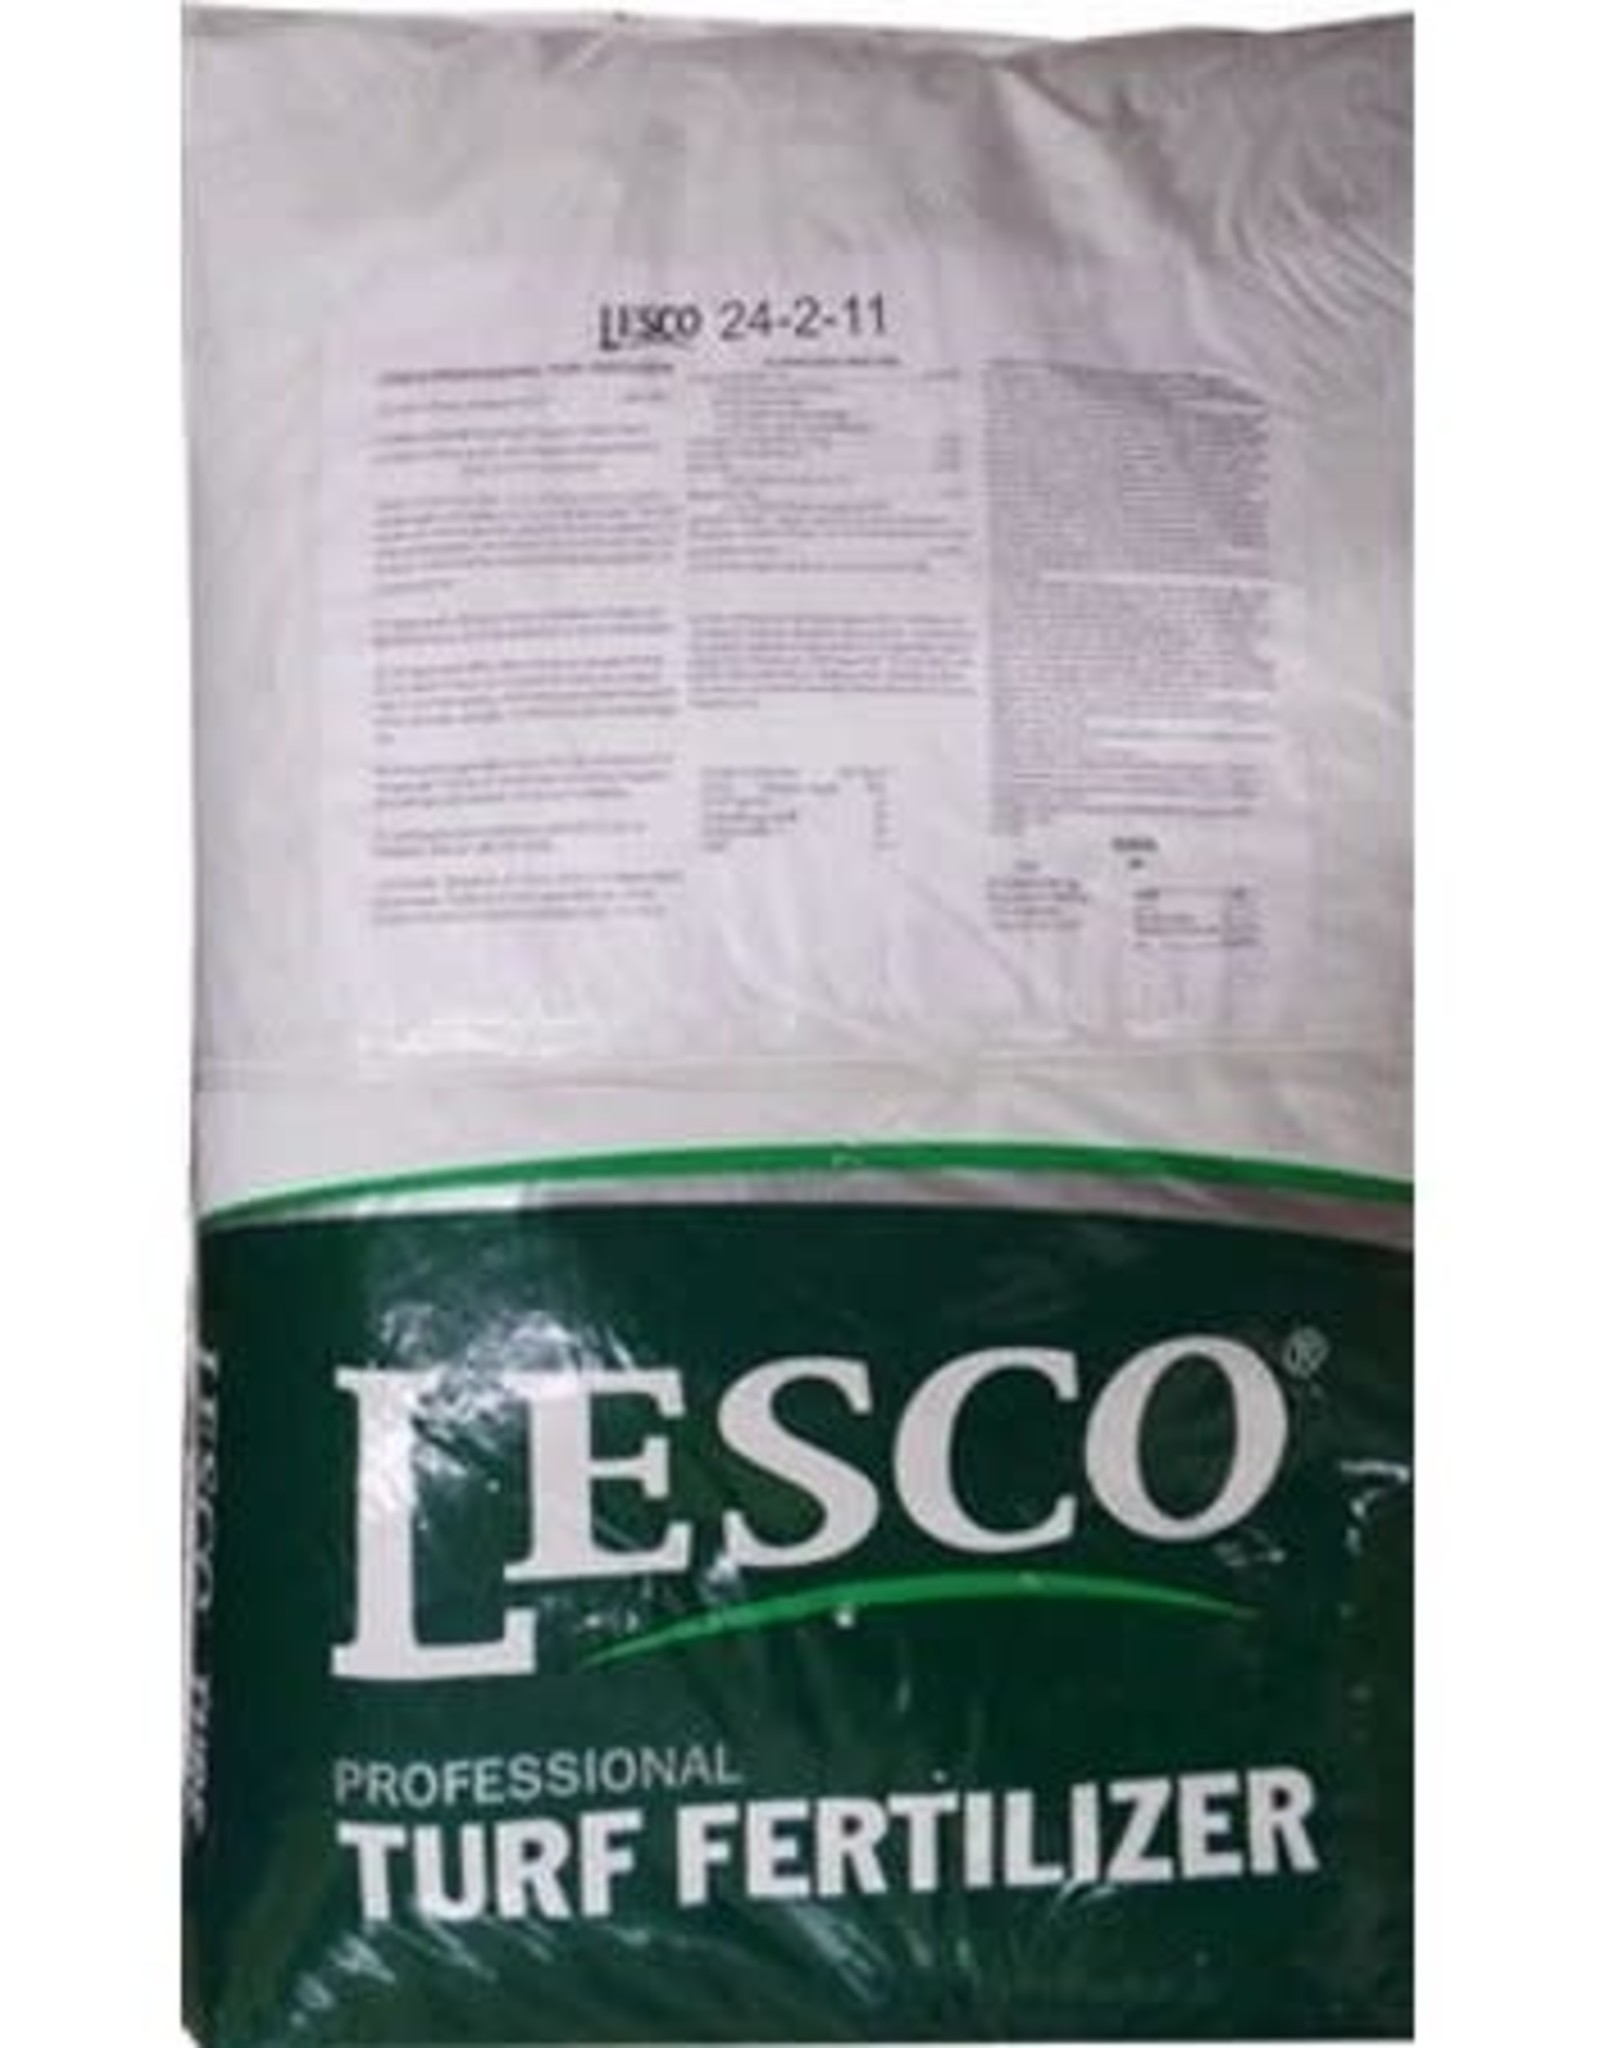 Lesco BULK LESCO Fertilizer 24-2-11 40% PolyPlus 6%Fe 1%Mn 50lb